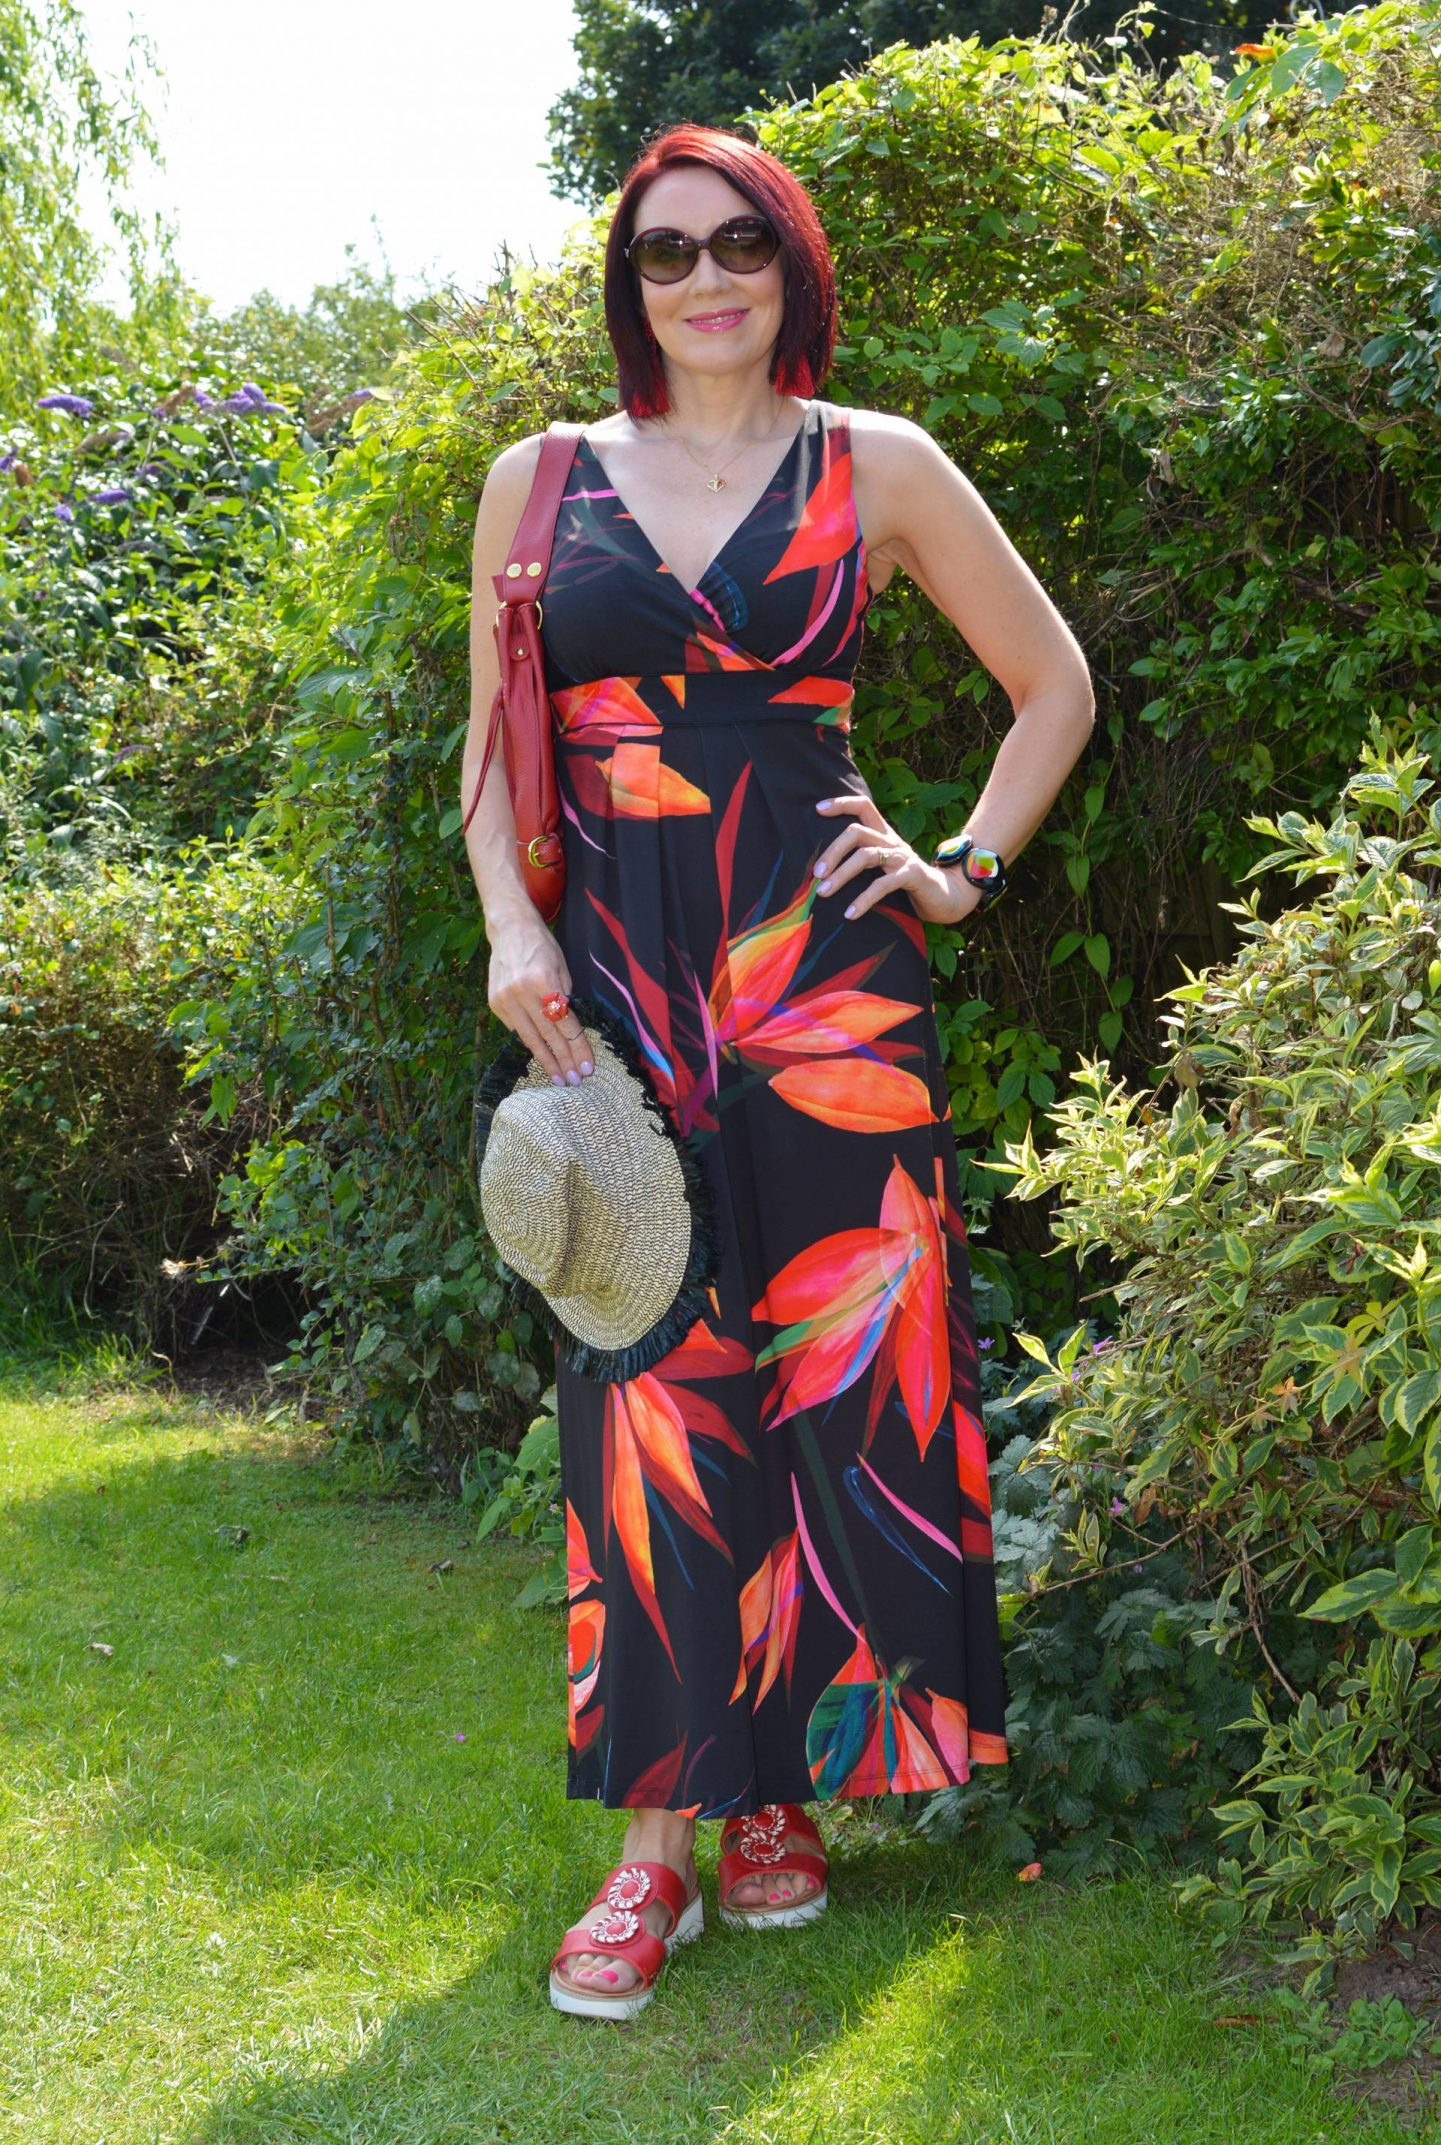 Monsoon Tropical Print Maxi Dress, Heavenly Feet Viva sandals